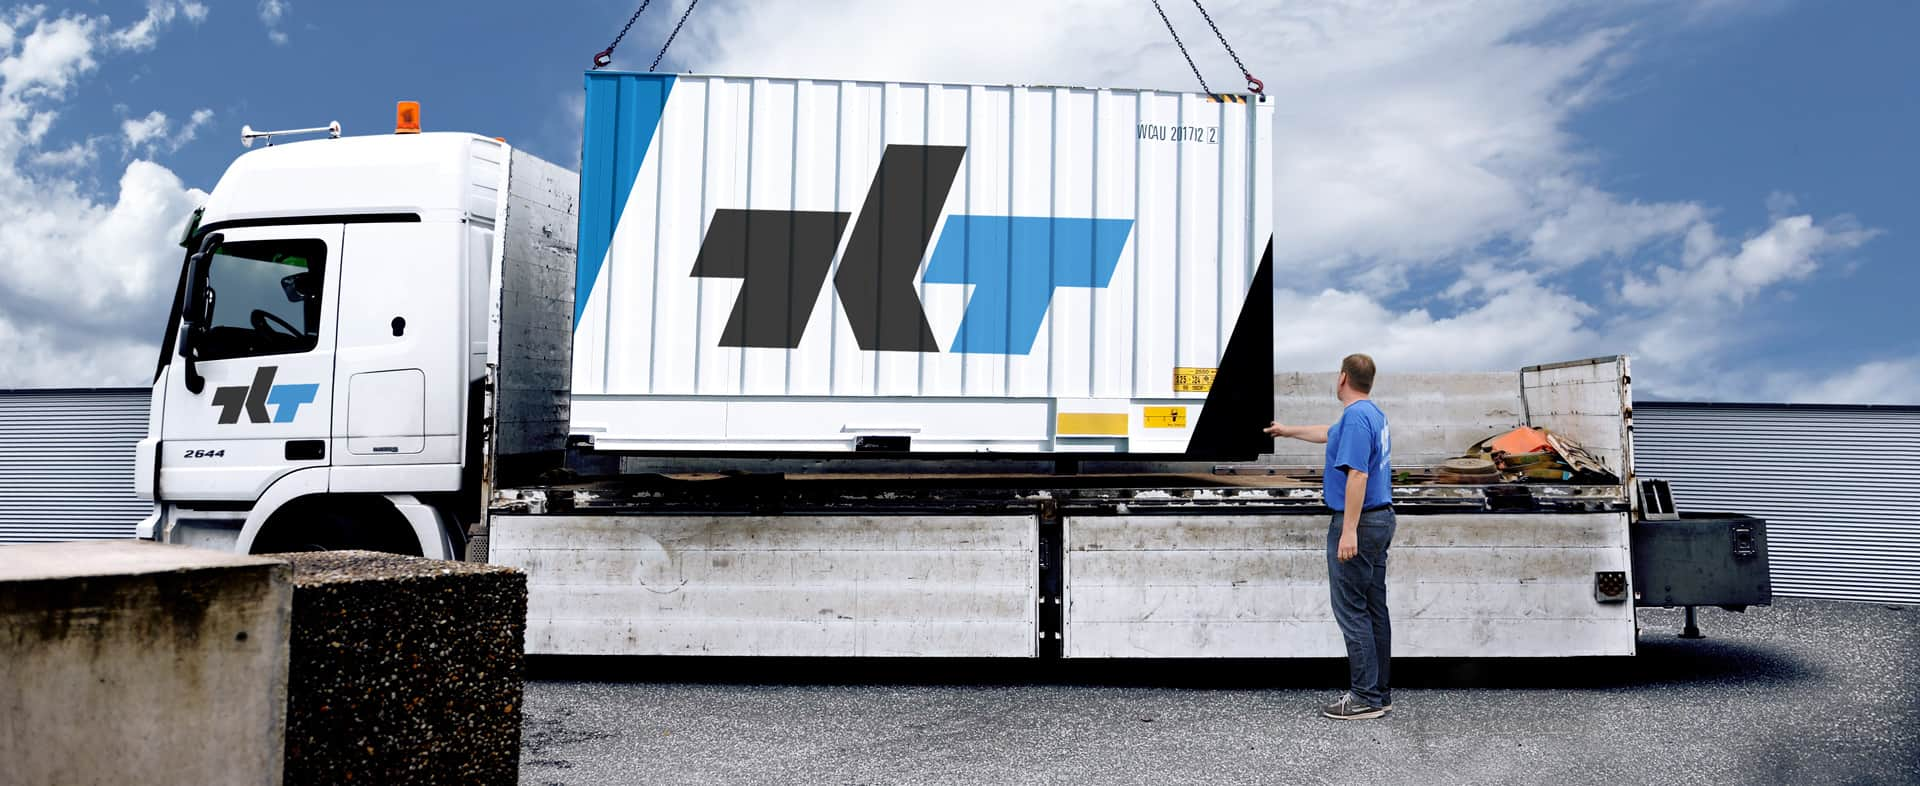 krug-transporte-neu-verpackt